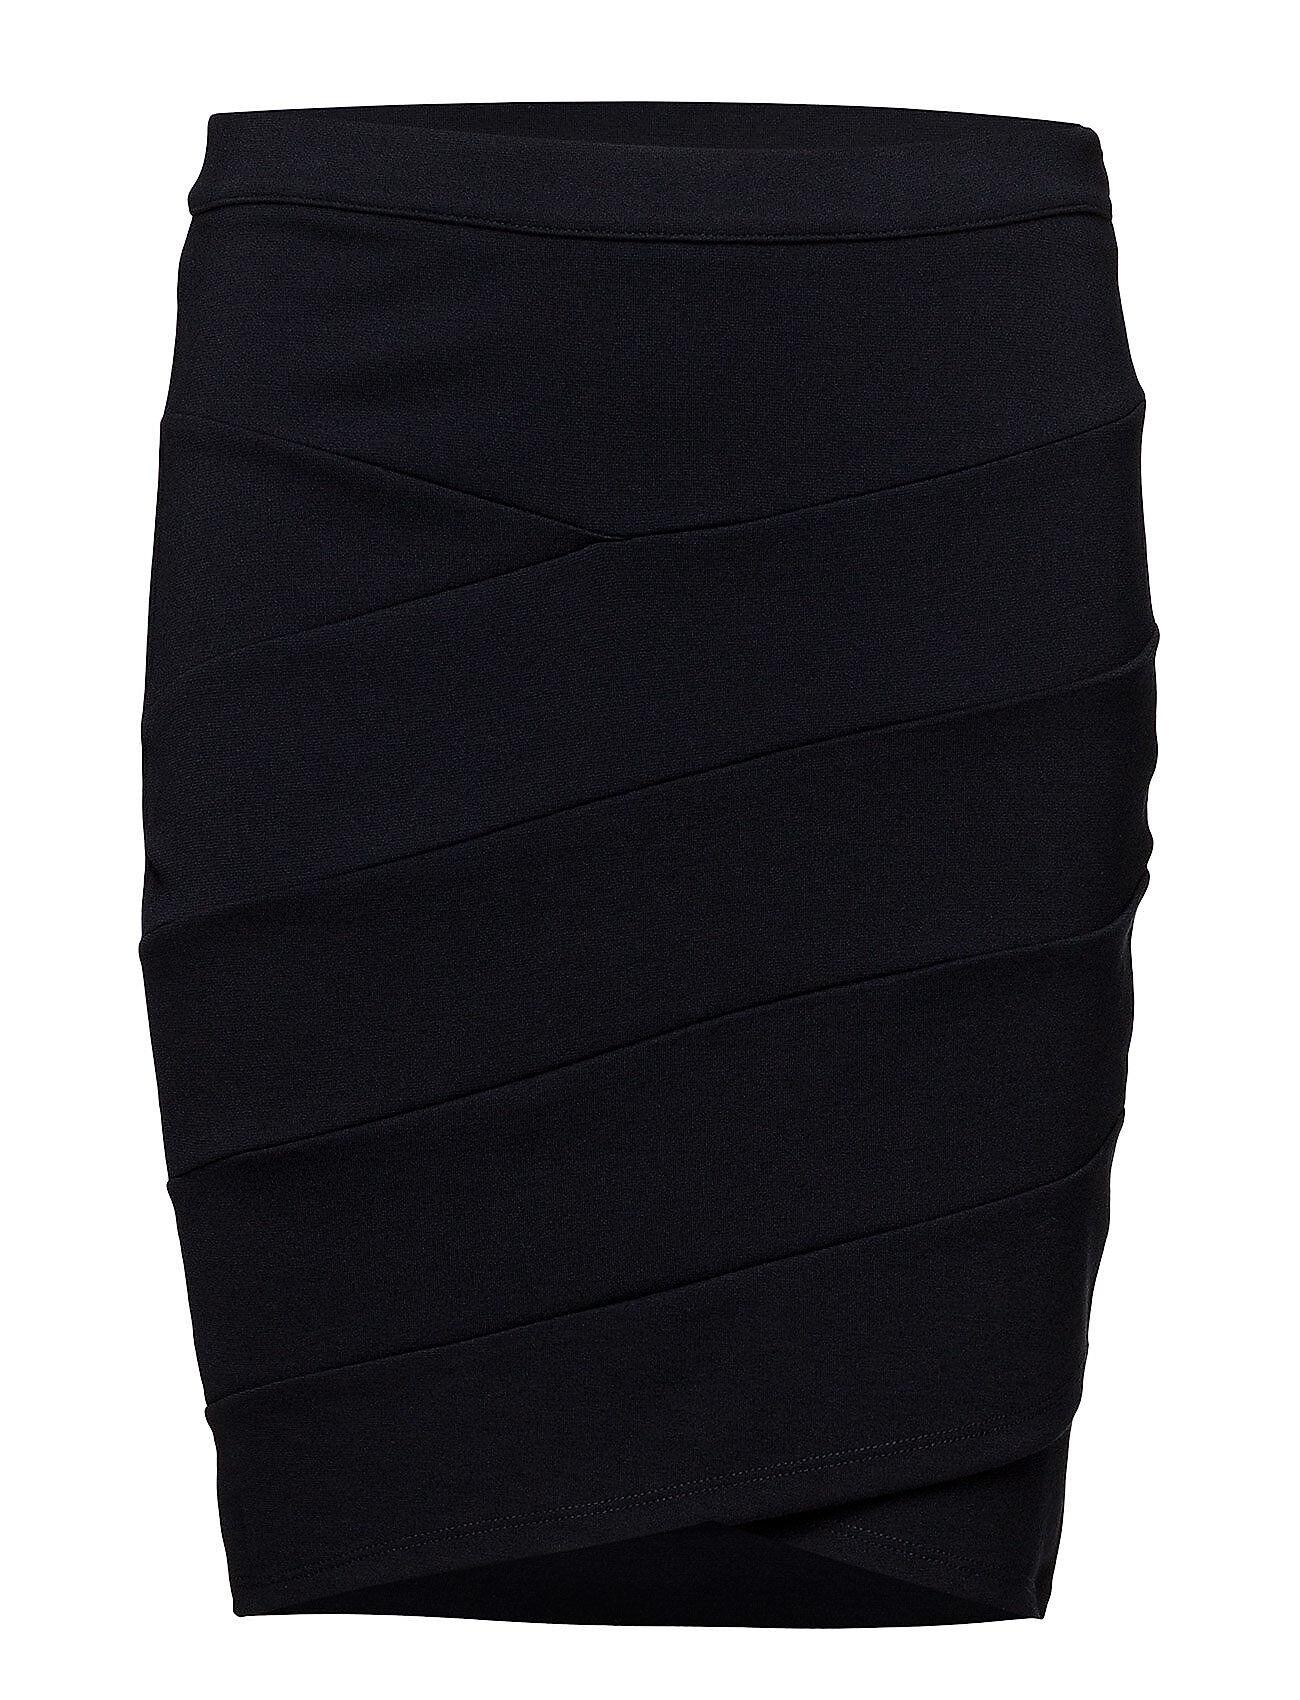 Saint Tropez Jersey Skirt Cut Lines Polvipituinen Hame Sininen Saint Tropez